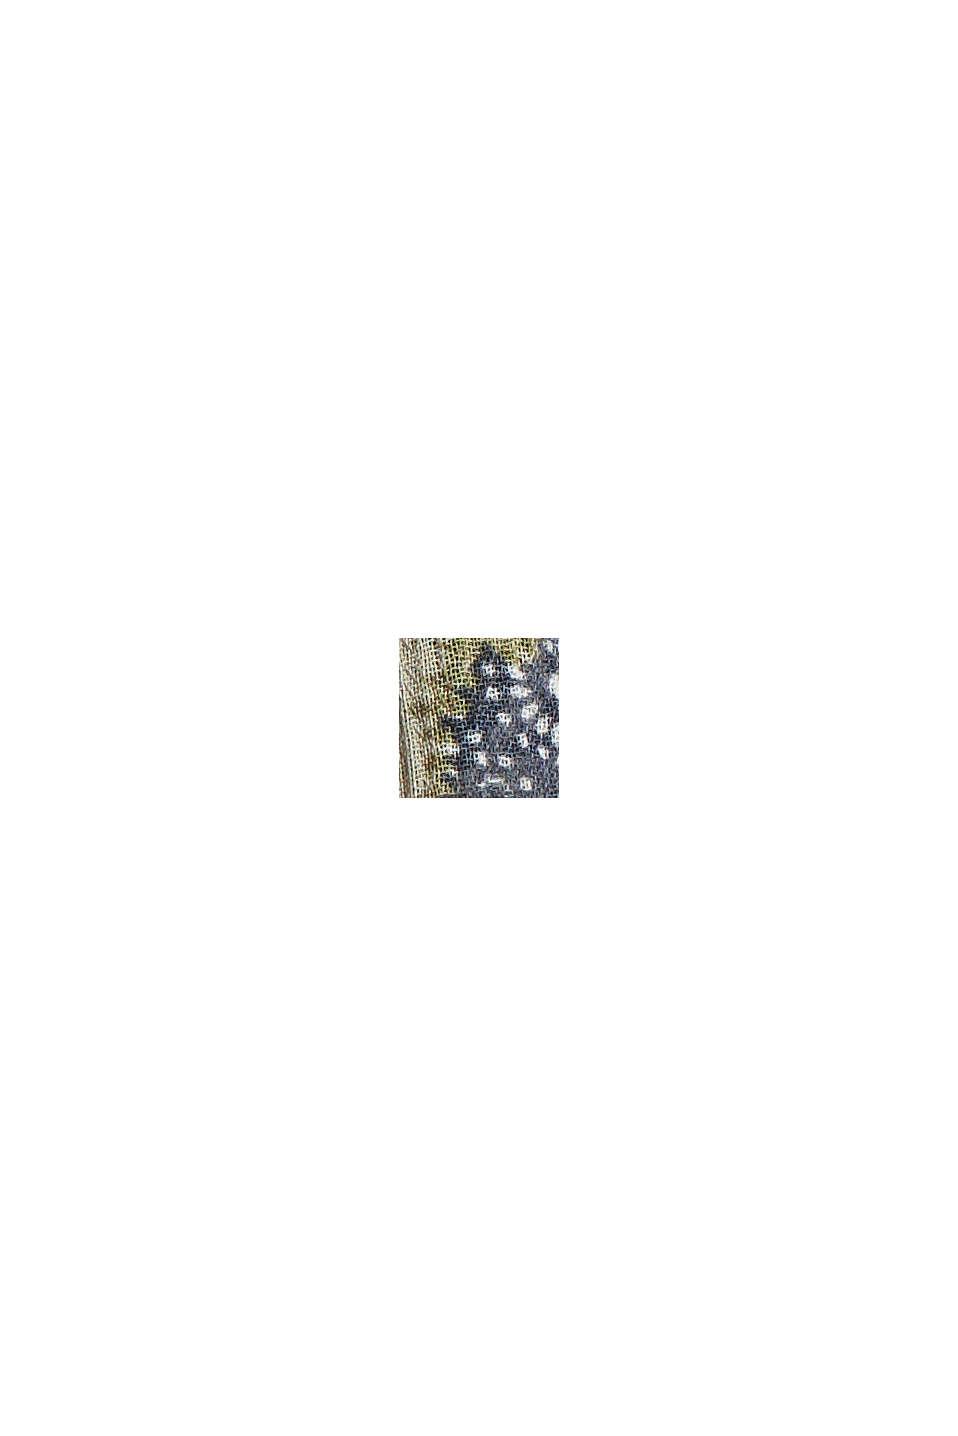 Chiffon-Bluse mit Top und Botanik-Print, TURQUOISE, swatch